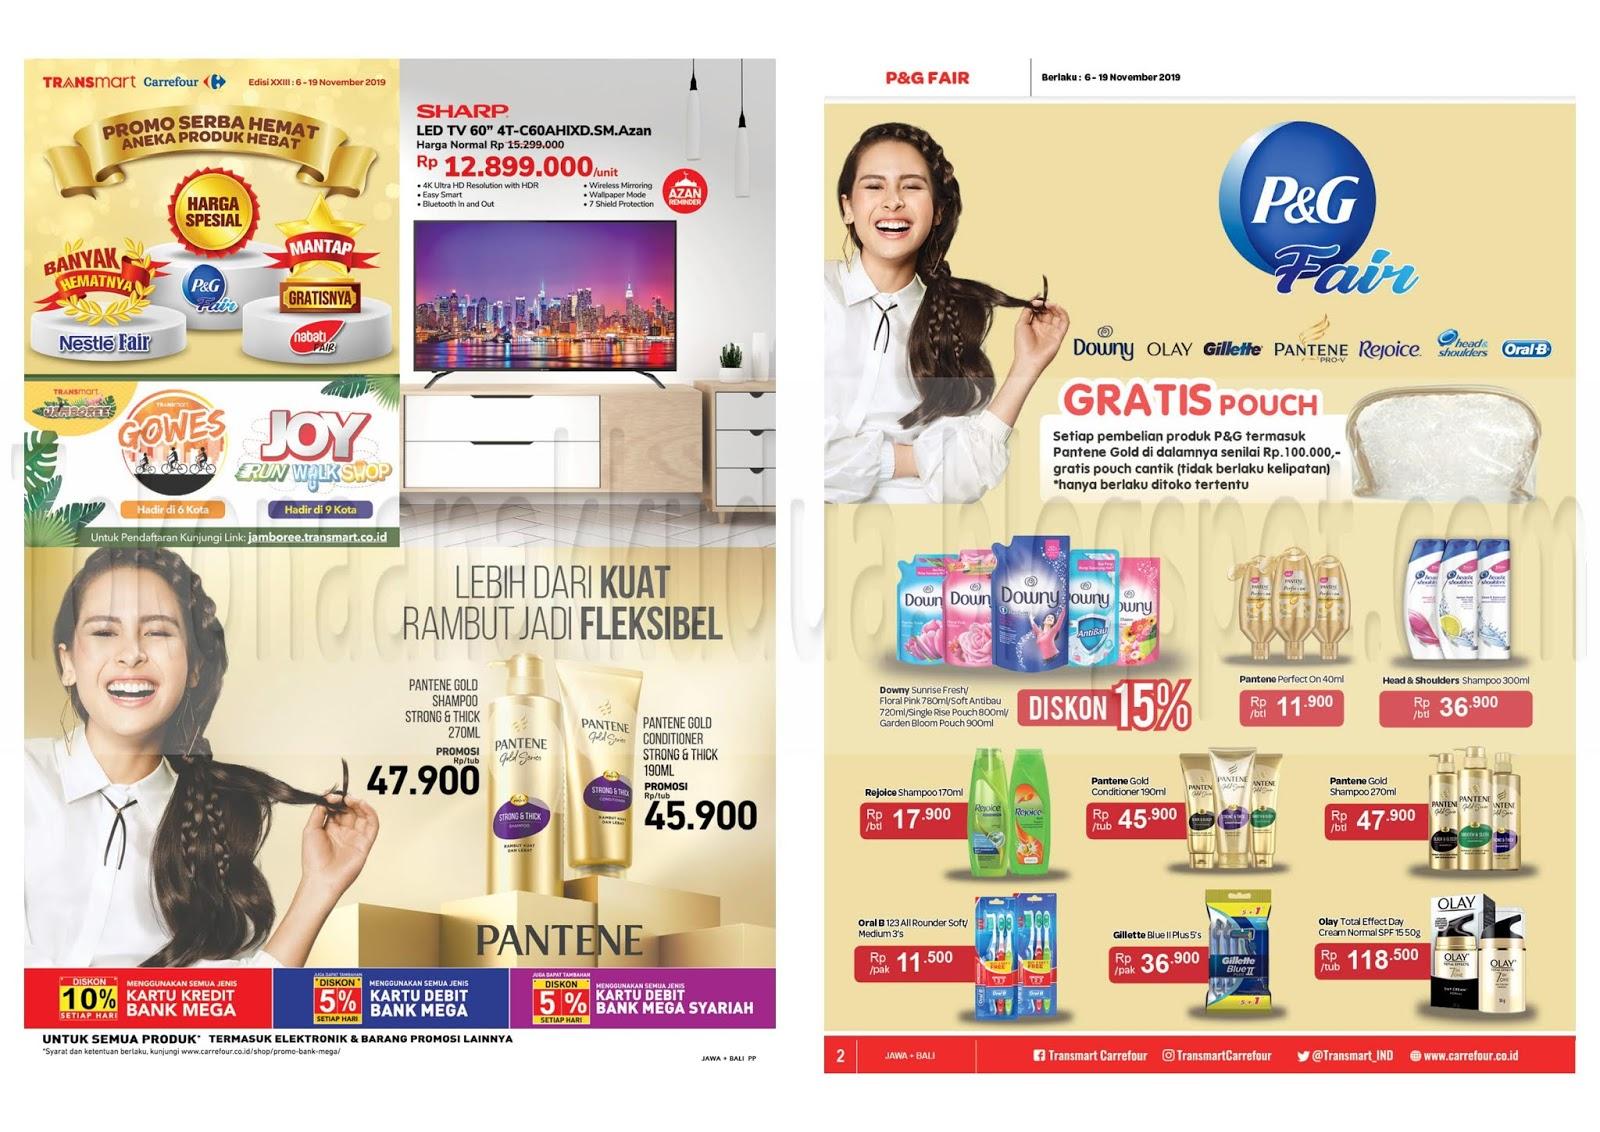 Promo Weekend Carrefour Terbaru